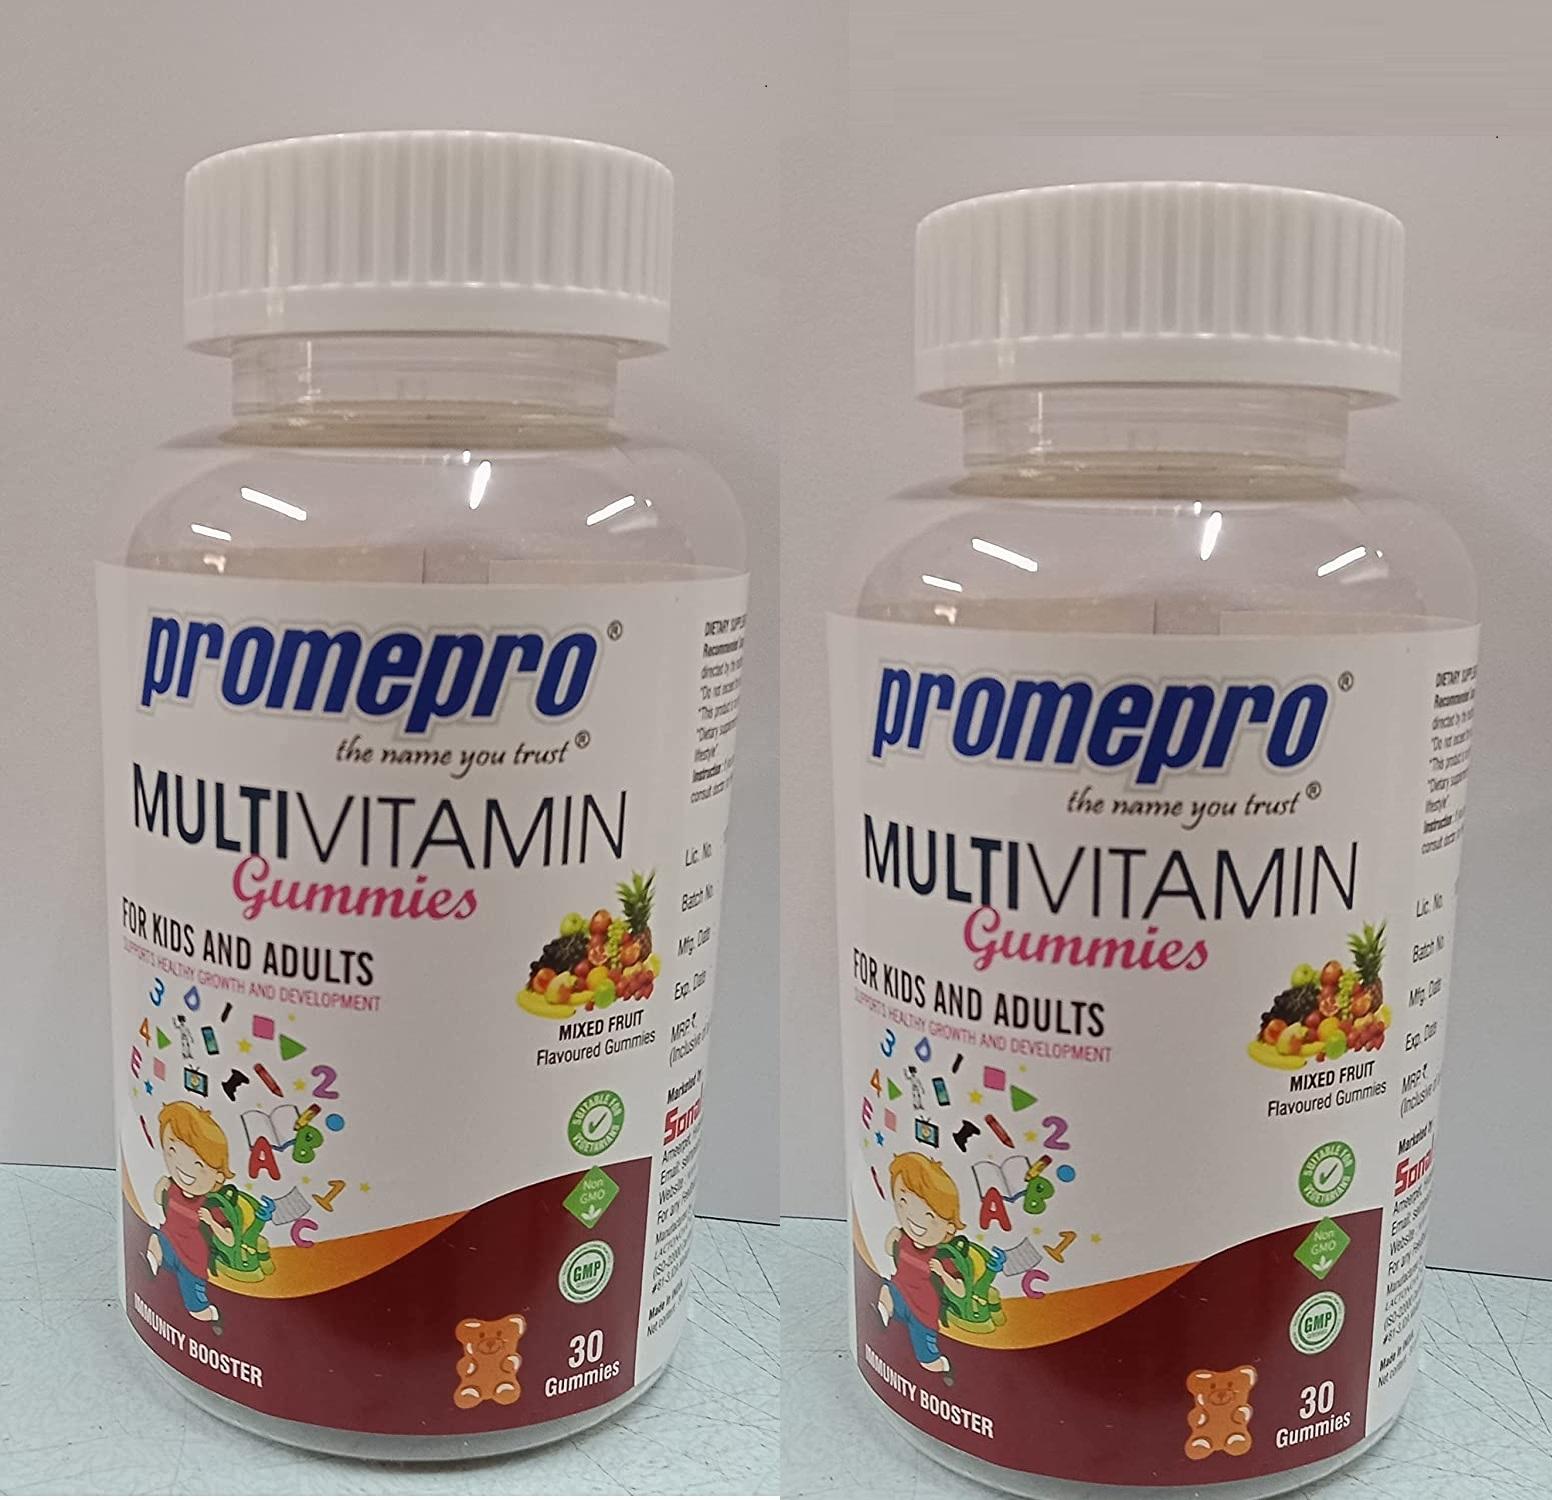 promepro multivitamin gummies - mixed fruit flavour, 30Gummies Pack Of 2